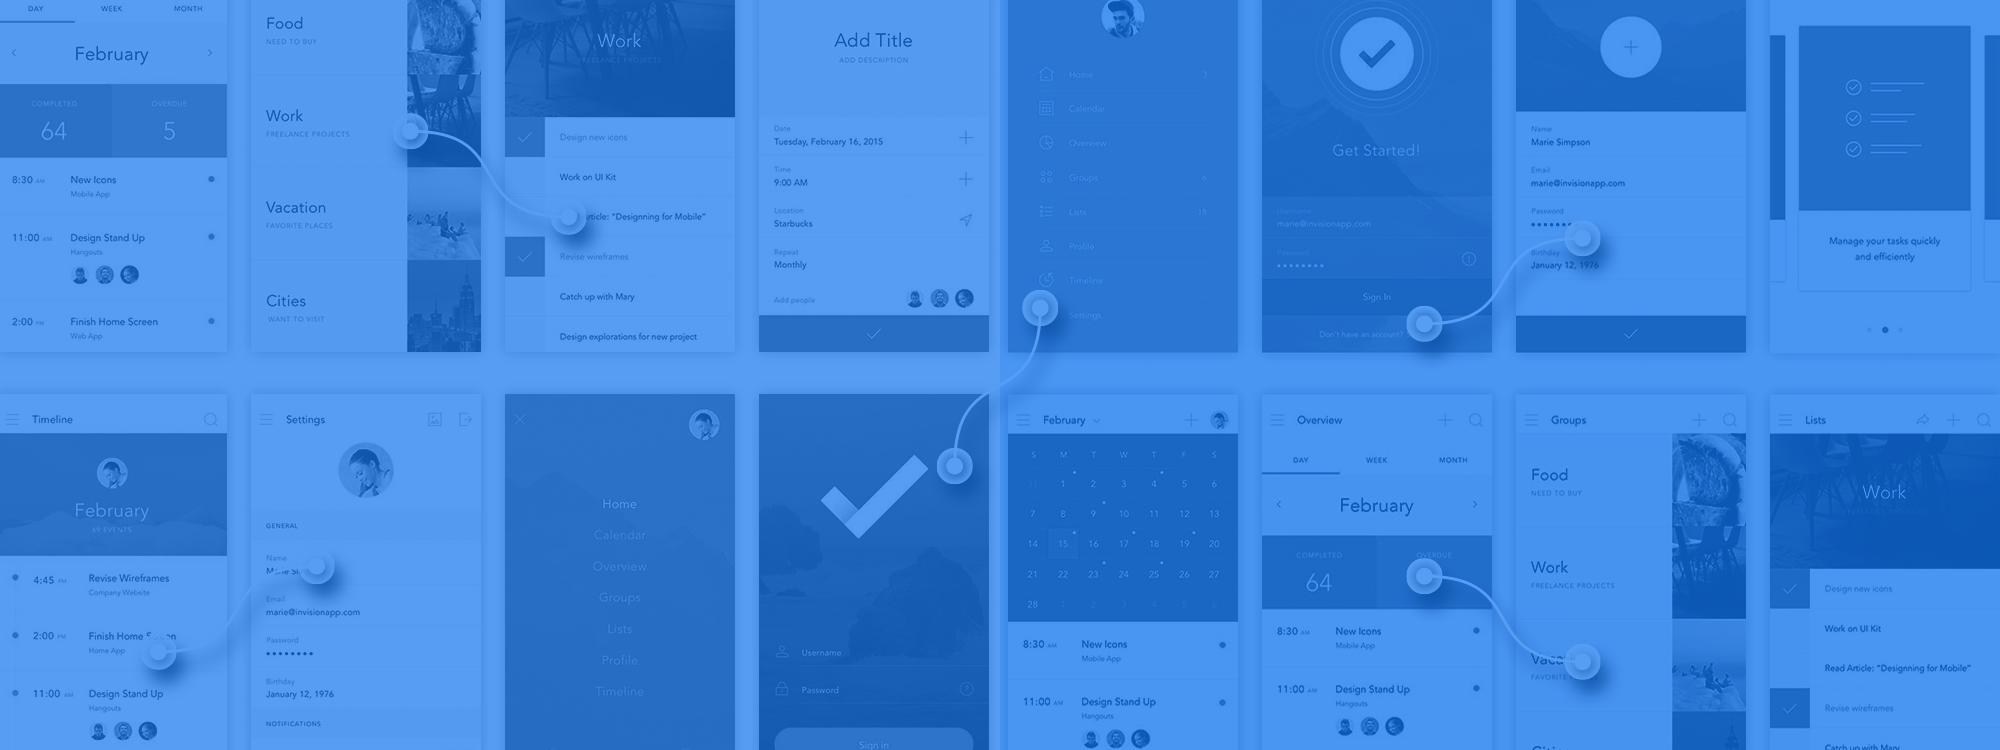 Invision Welcomes Silver Flows To Bring Prototyping Into Sketch Inside Design Blog Inside Design Design Flow